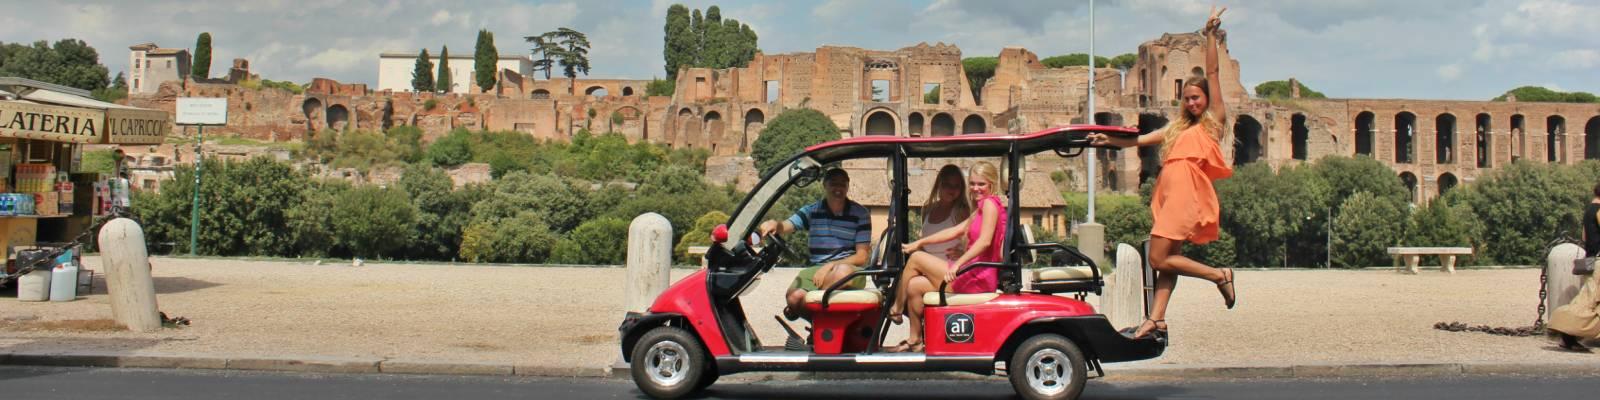 Golfwagen rom